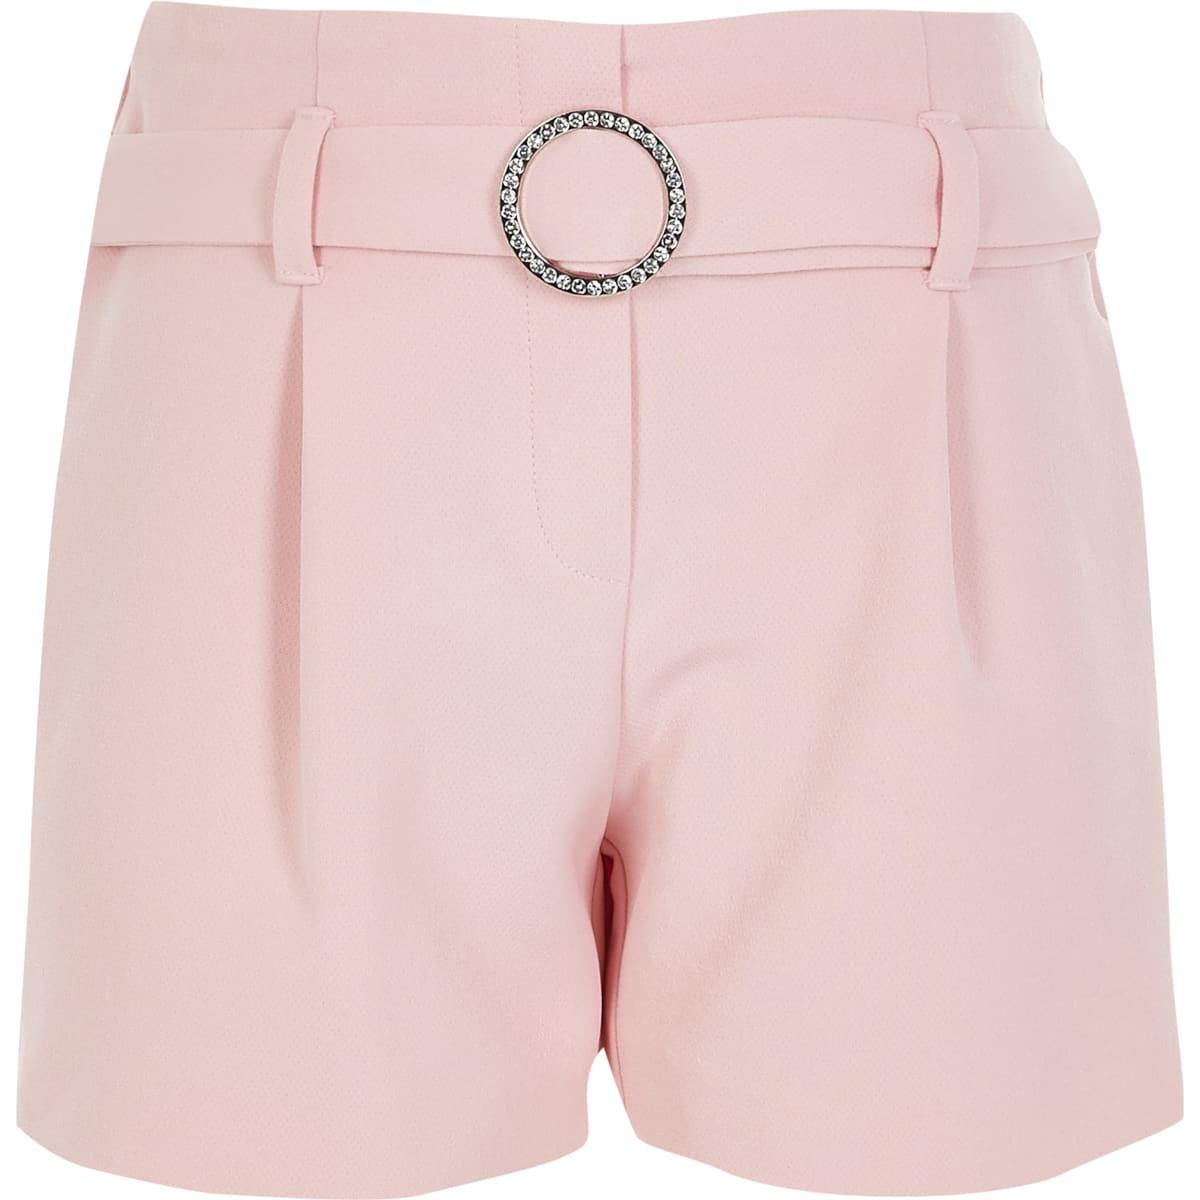 Girls pink diamante belted shorts